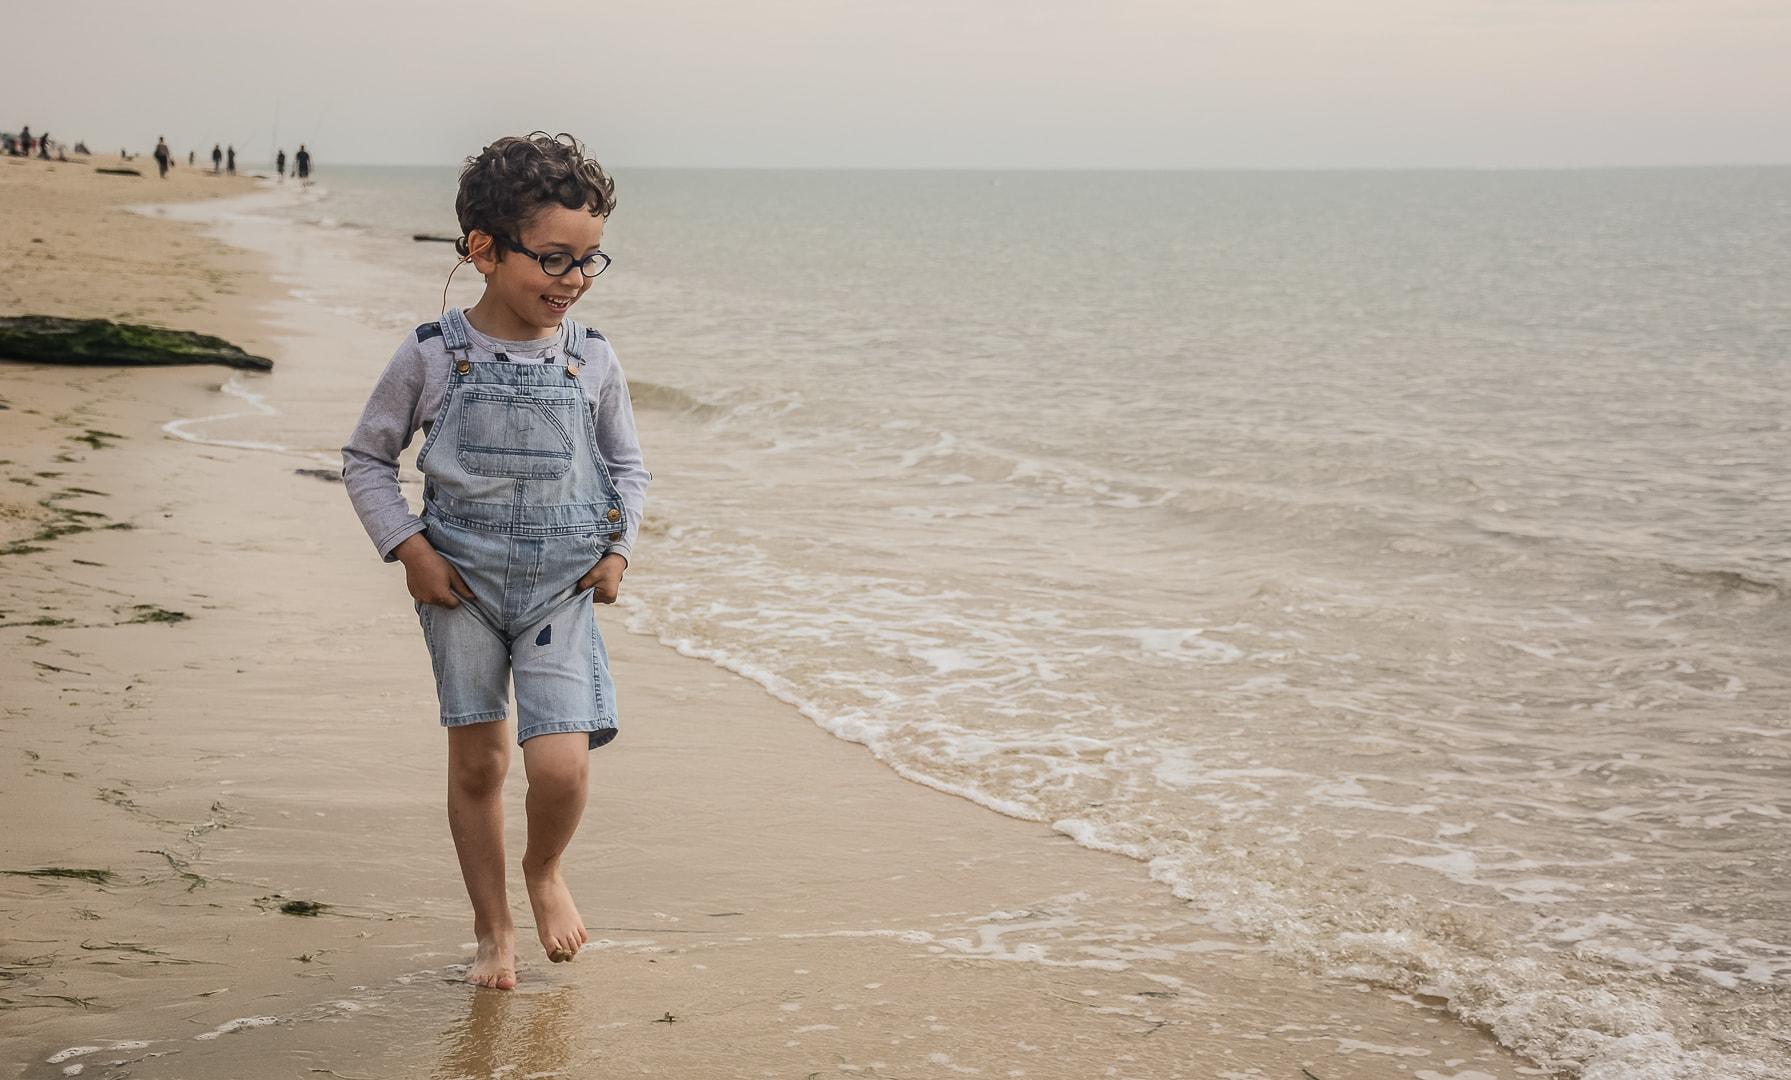 trezors-photography-photographe-professionnel-toulouse-31-enfance-seance-famille-lifestyle (1)